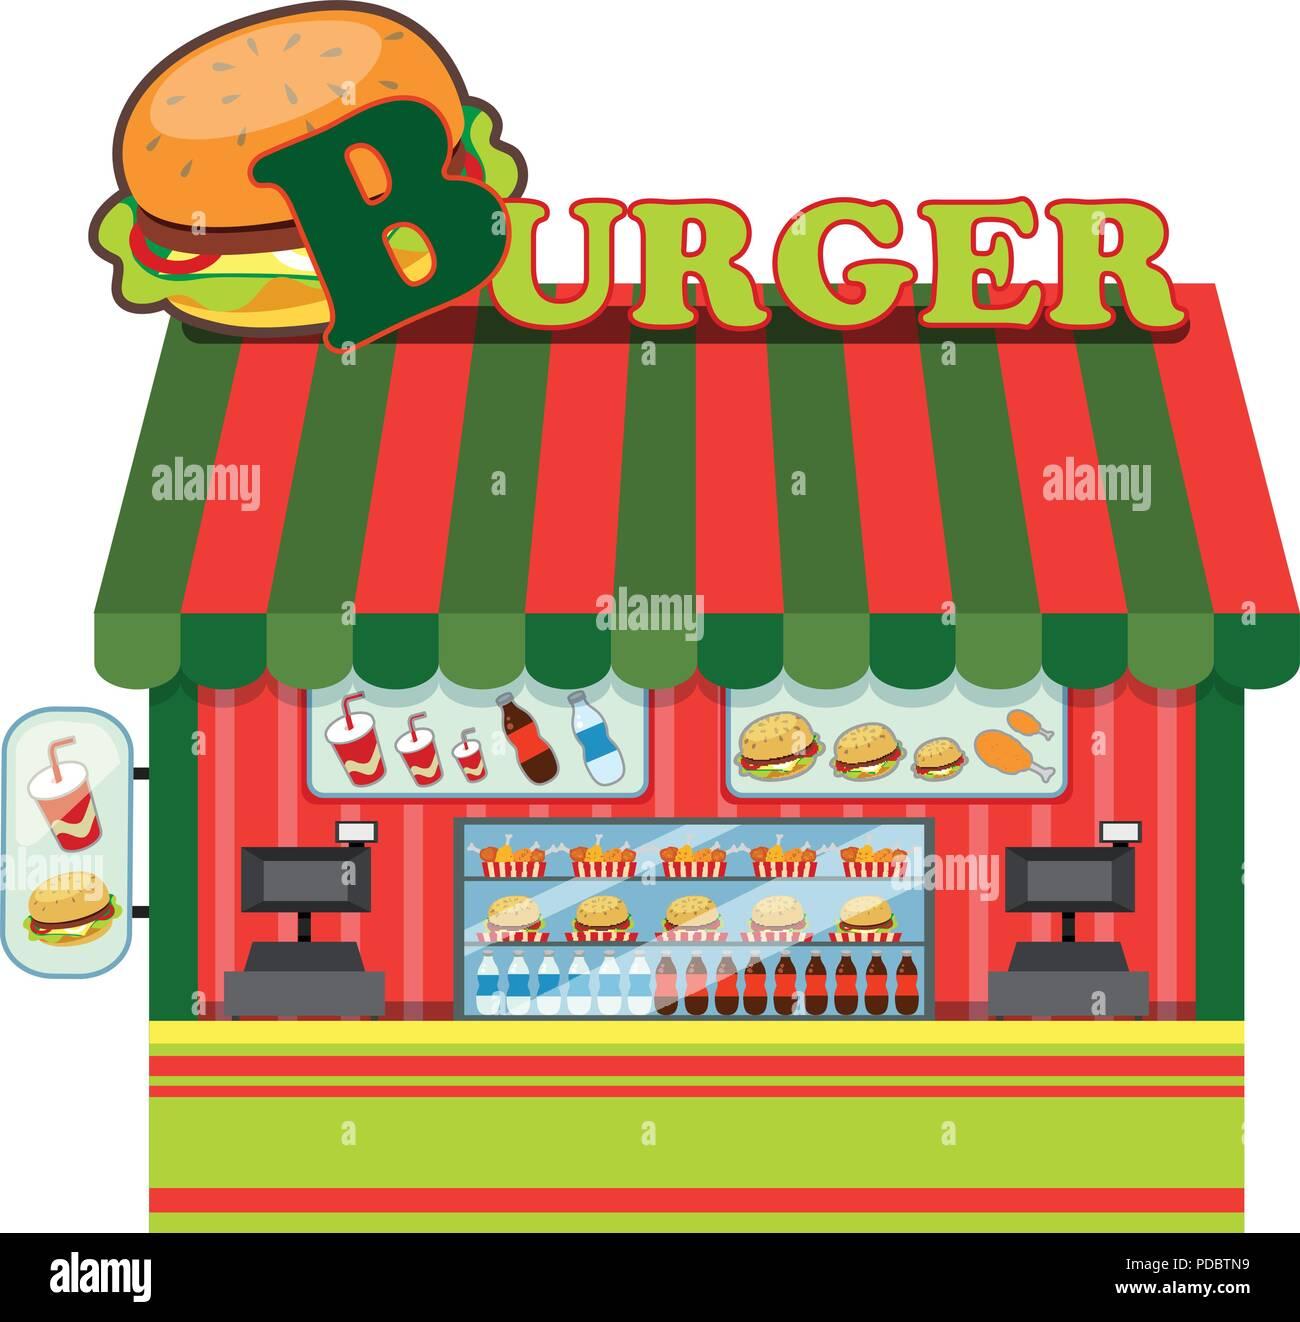 Exterior of a burger shop illustration - Stock Vector